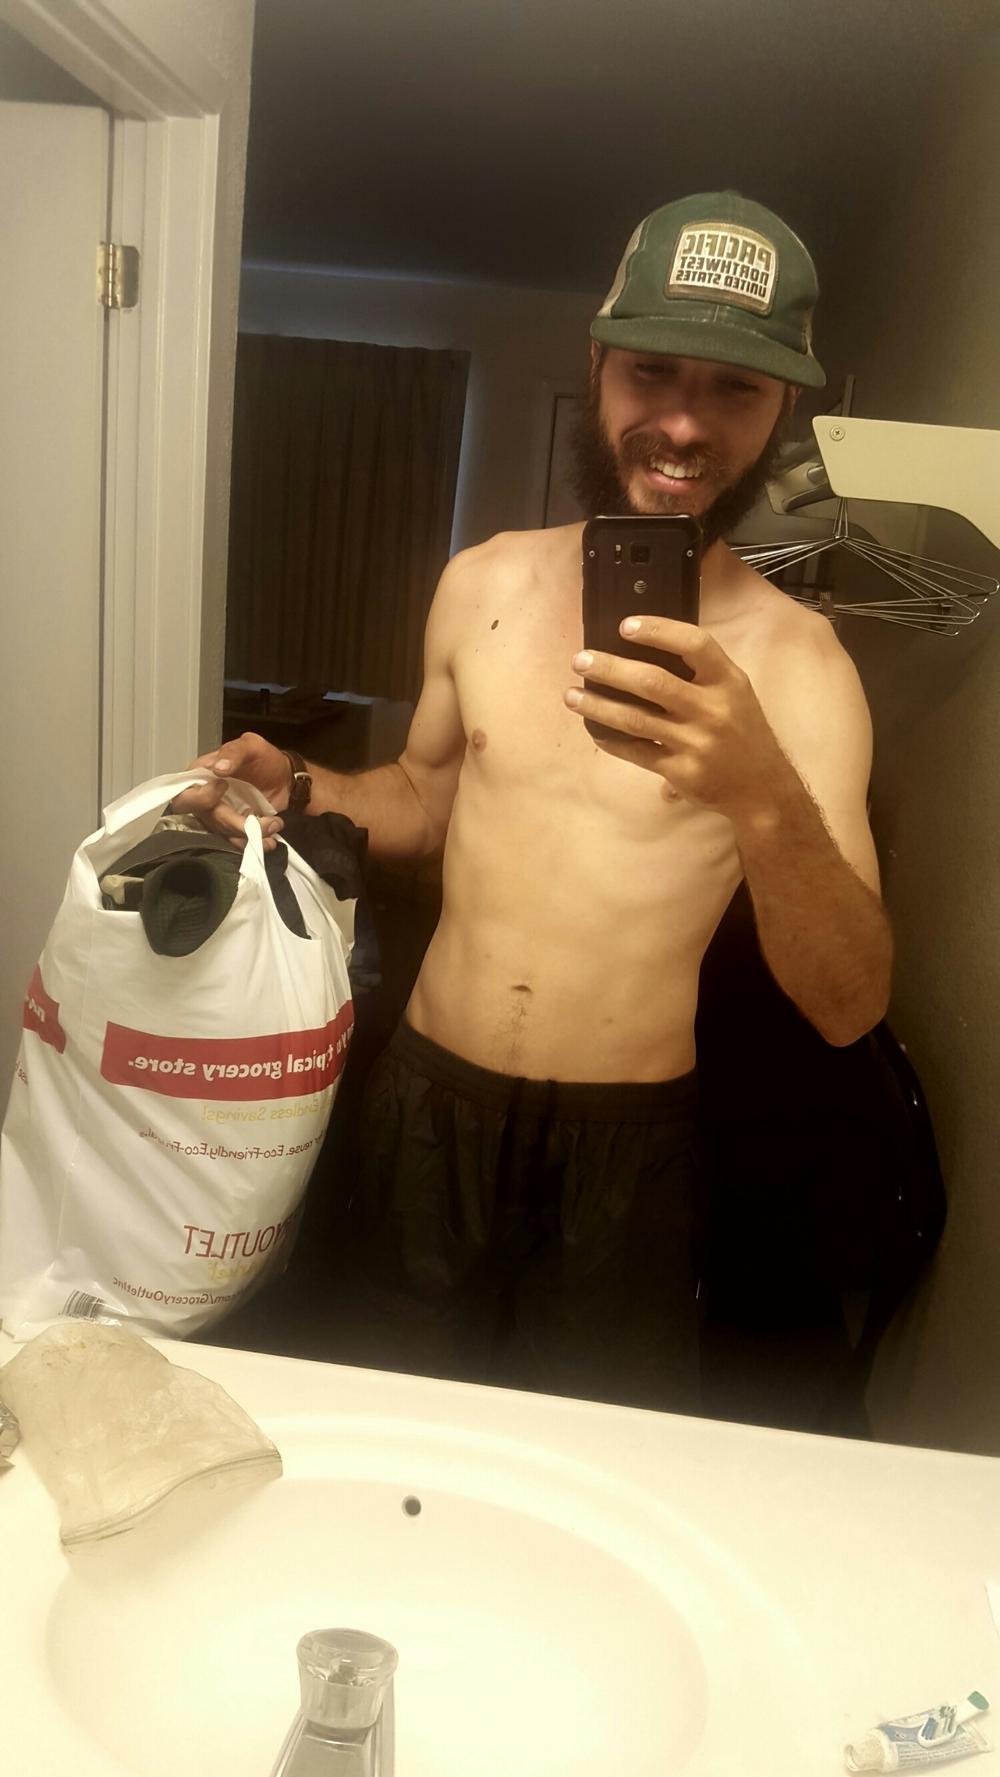 Laundry trip